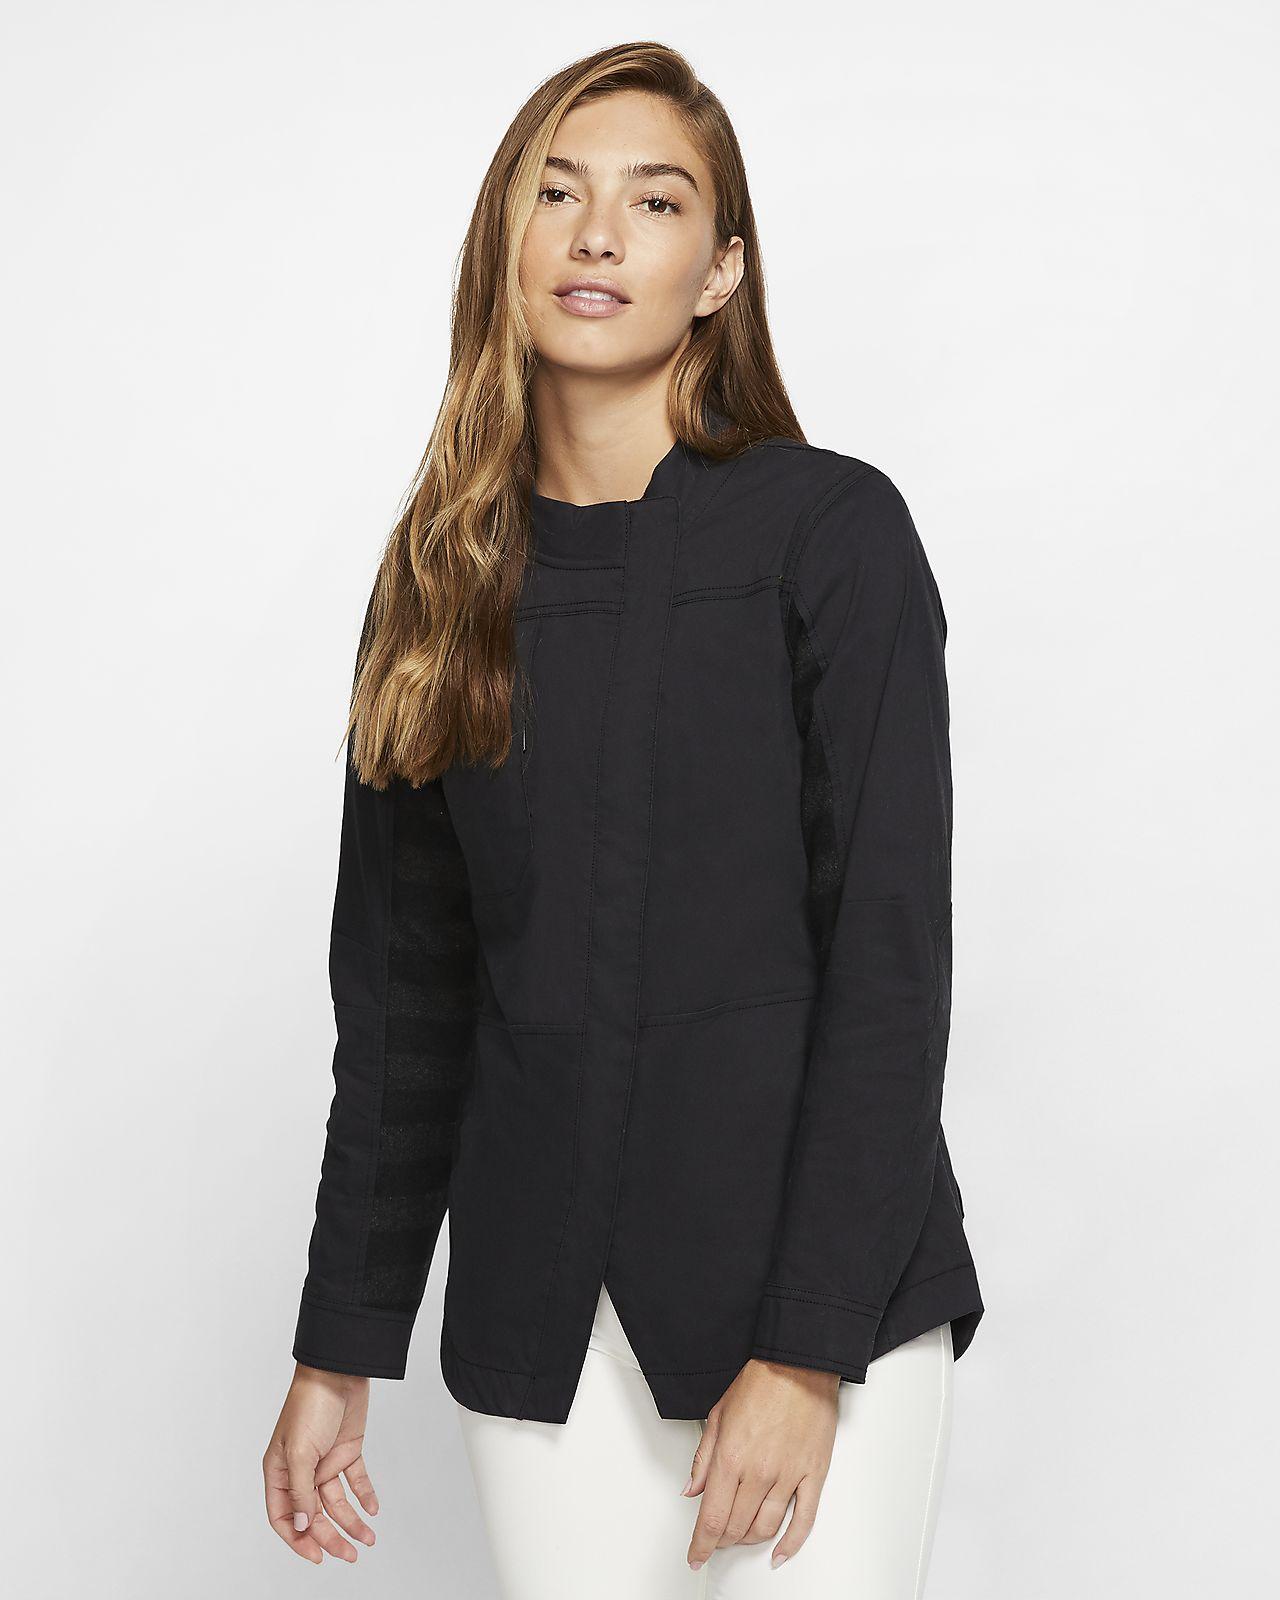 Hurley x Roland Sands Winchester Women's Jacket